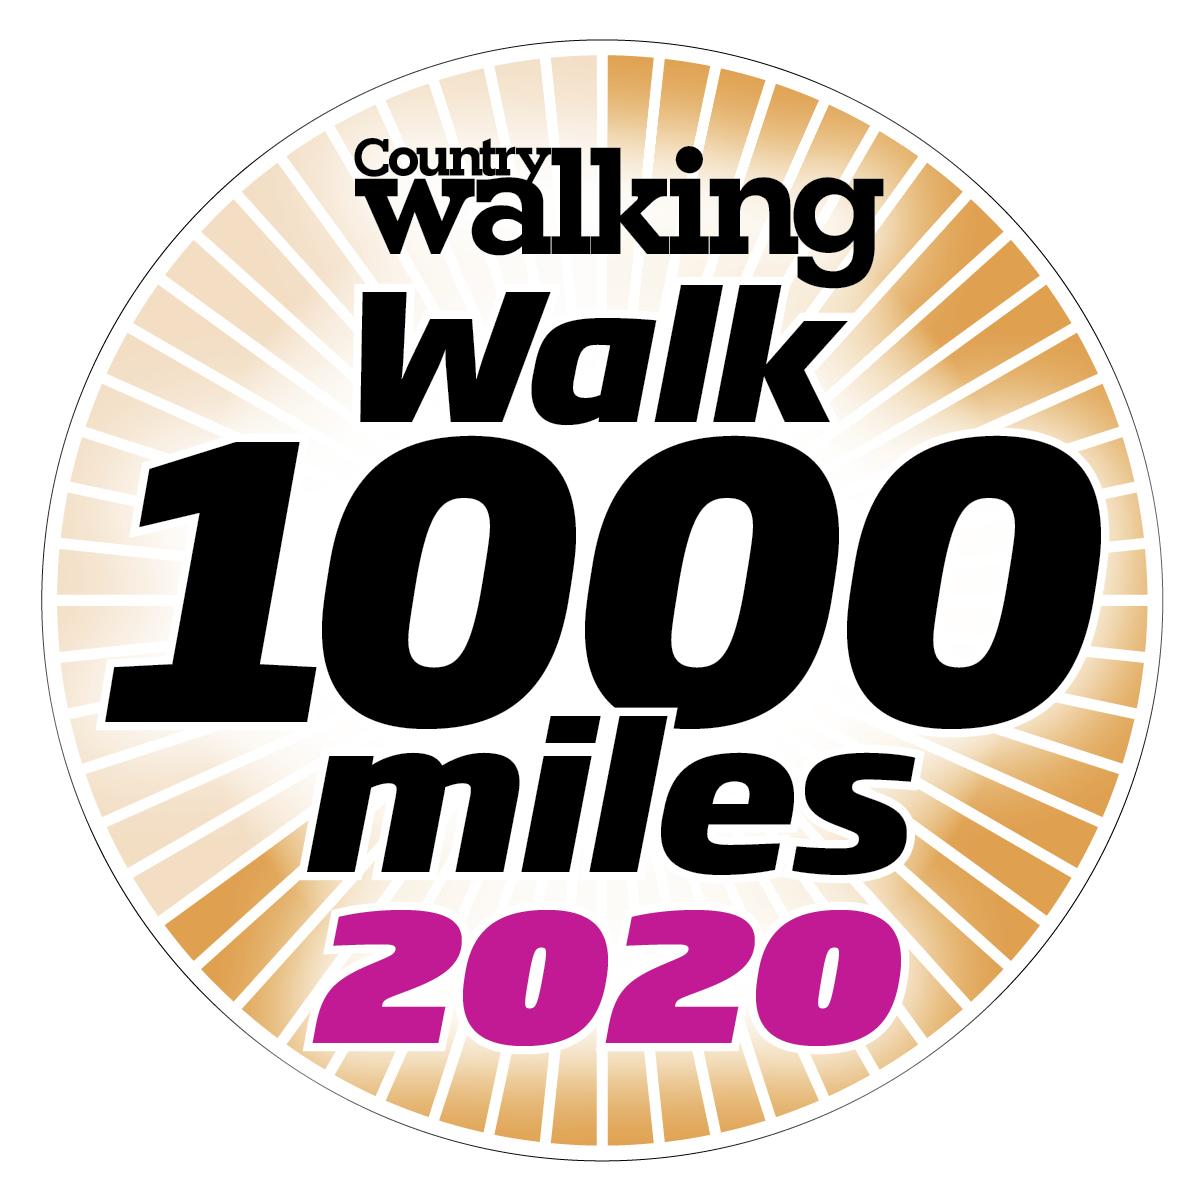 Image result for #walk1000miles